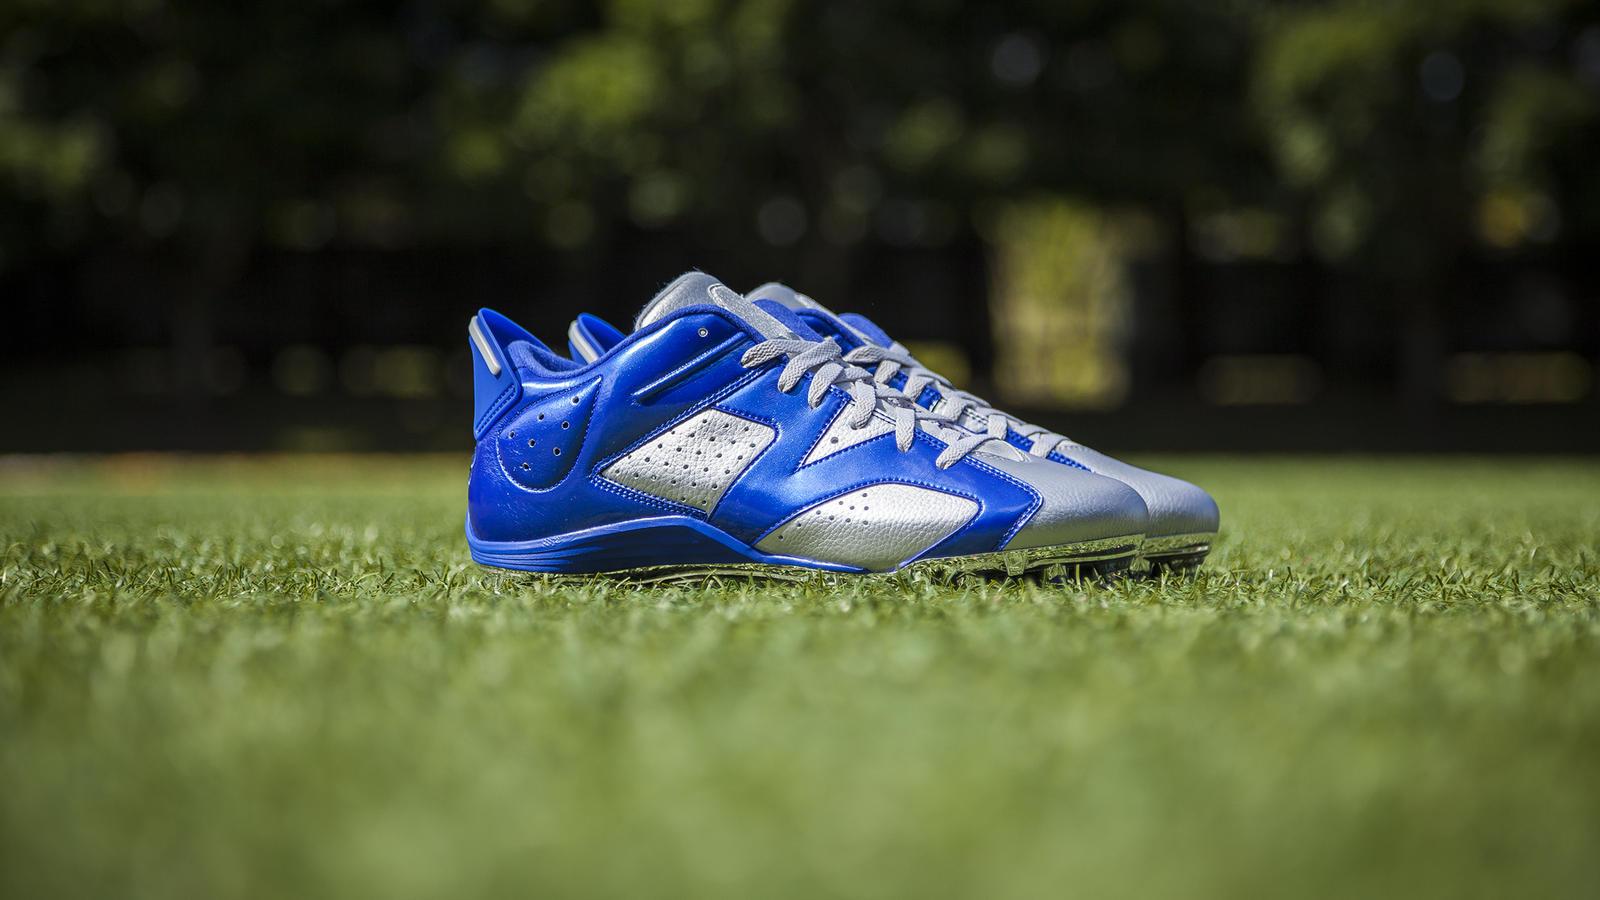 Jordan Brand Football Athletes Don Air Jordan Vi Cleats To